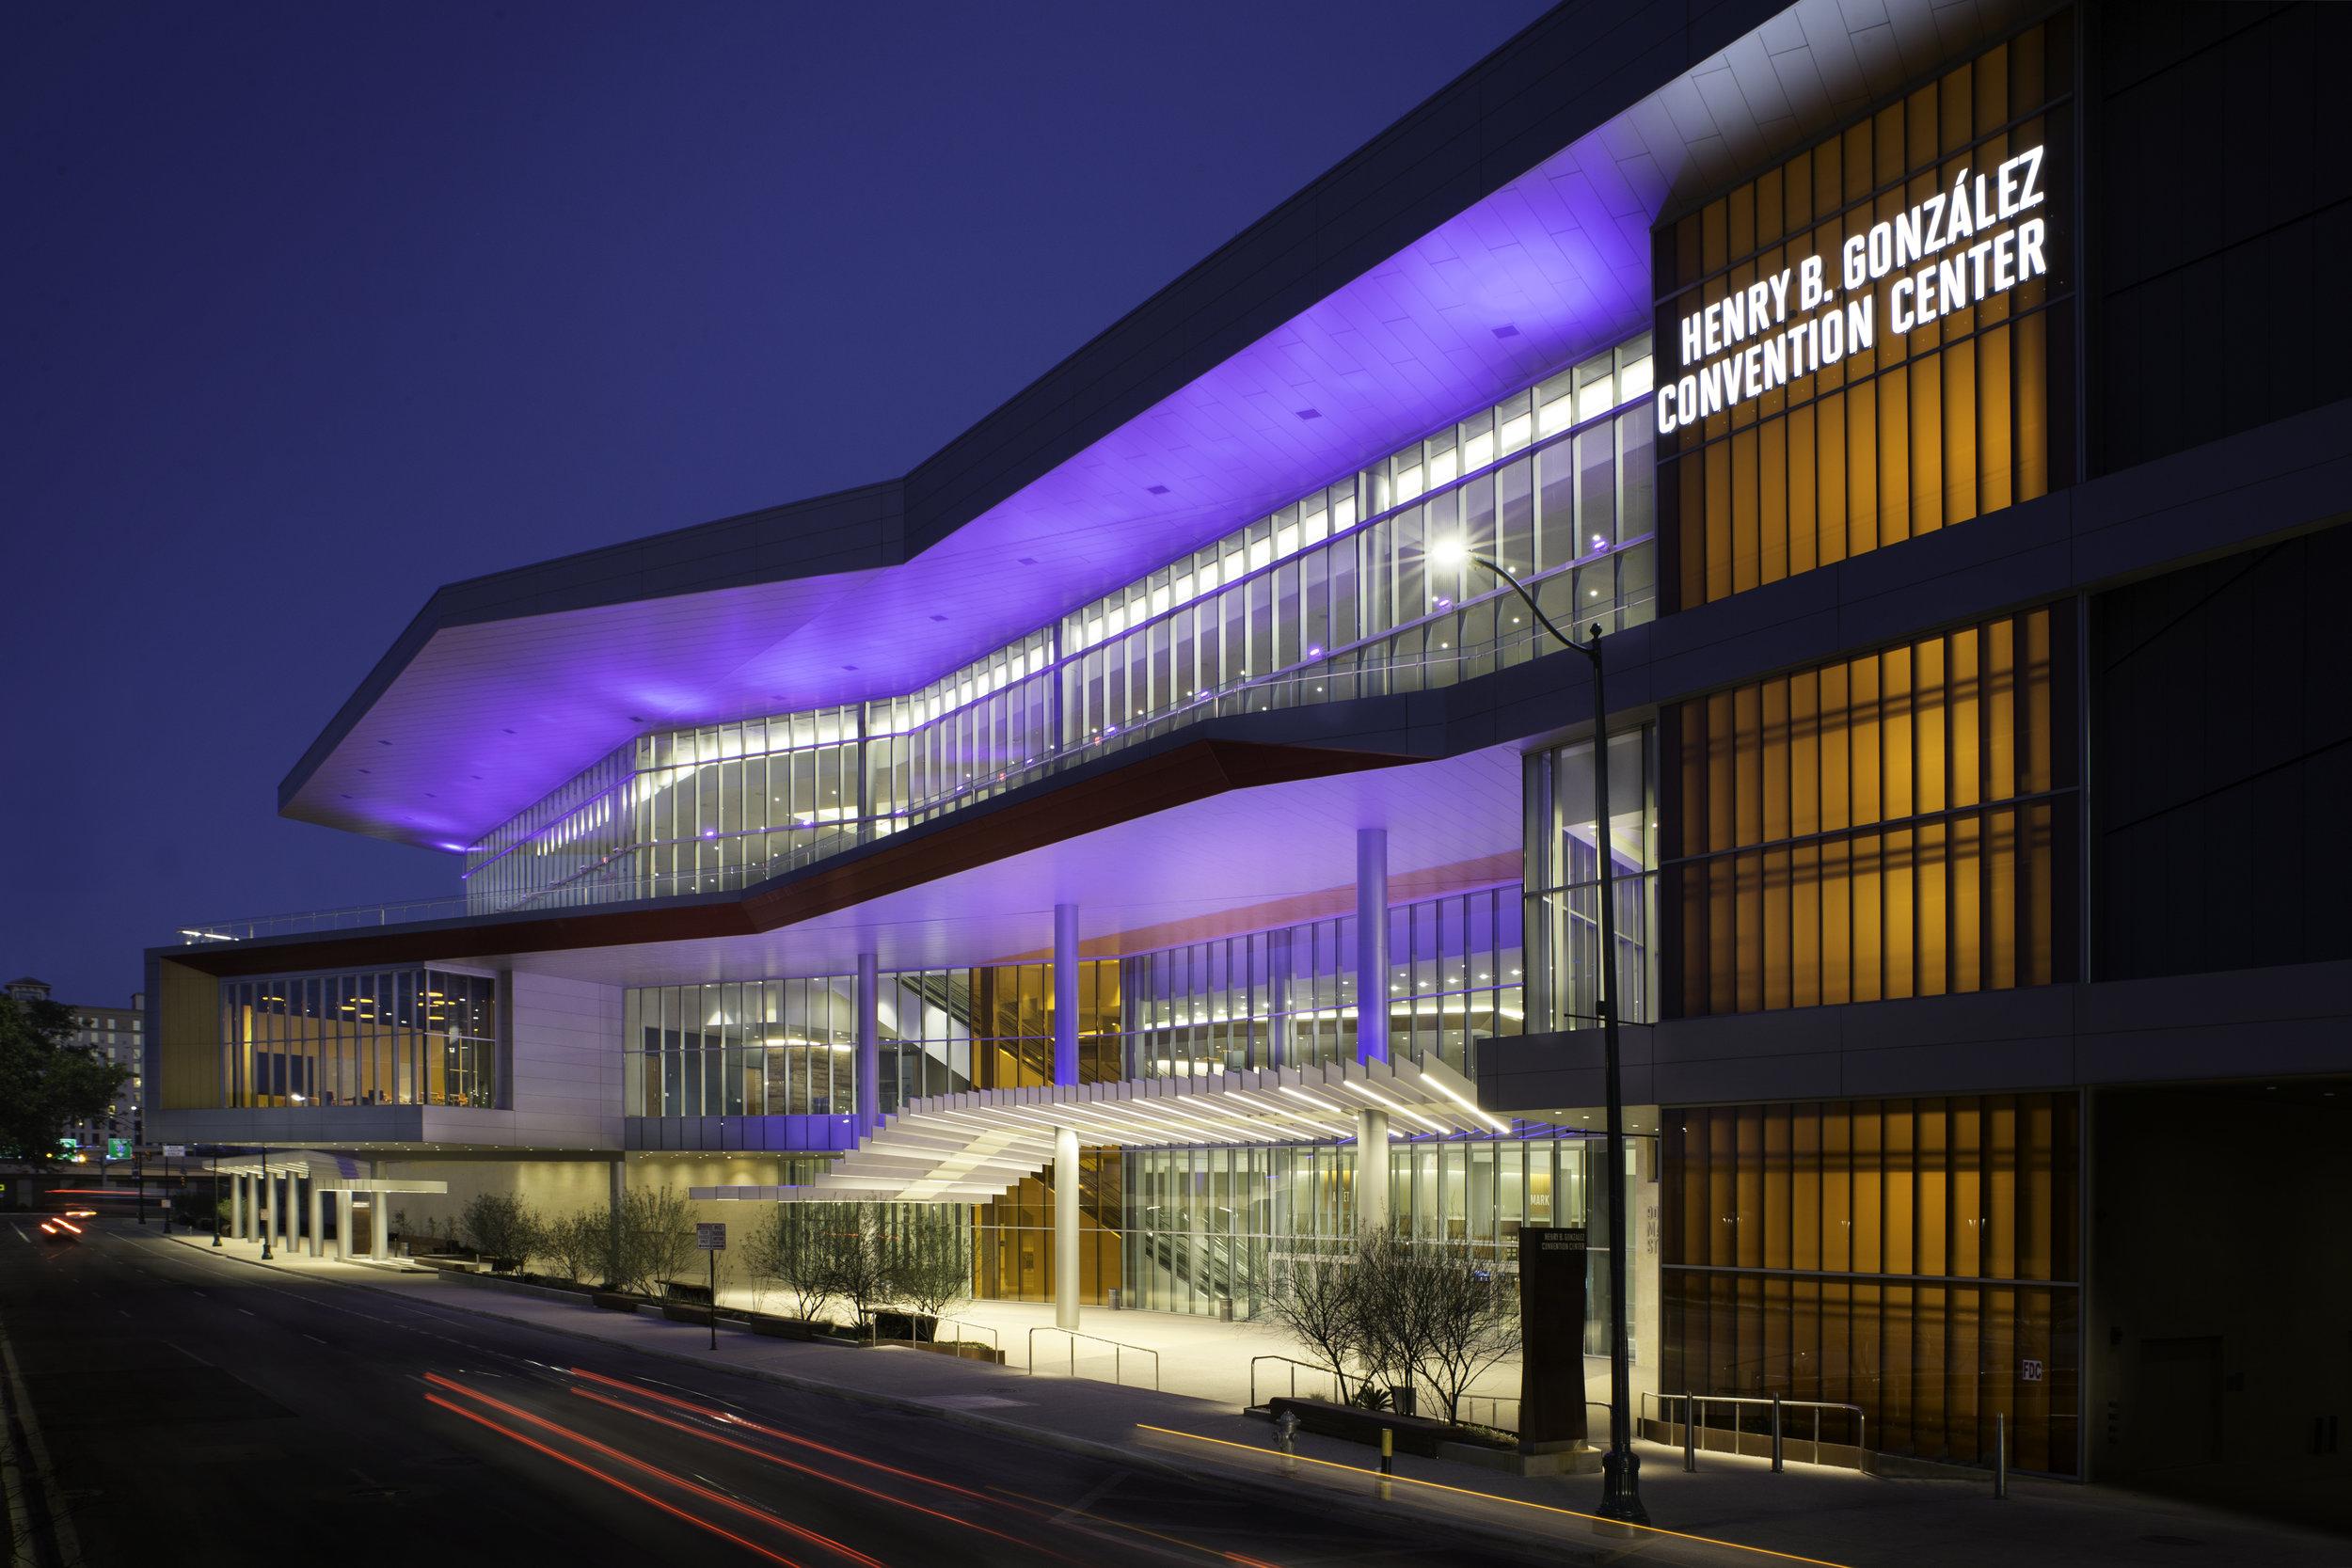 Henry B Gonzalez Convention Center.jpg